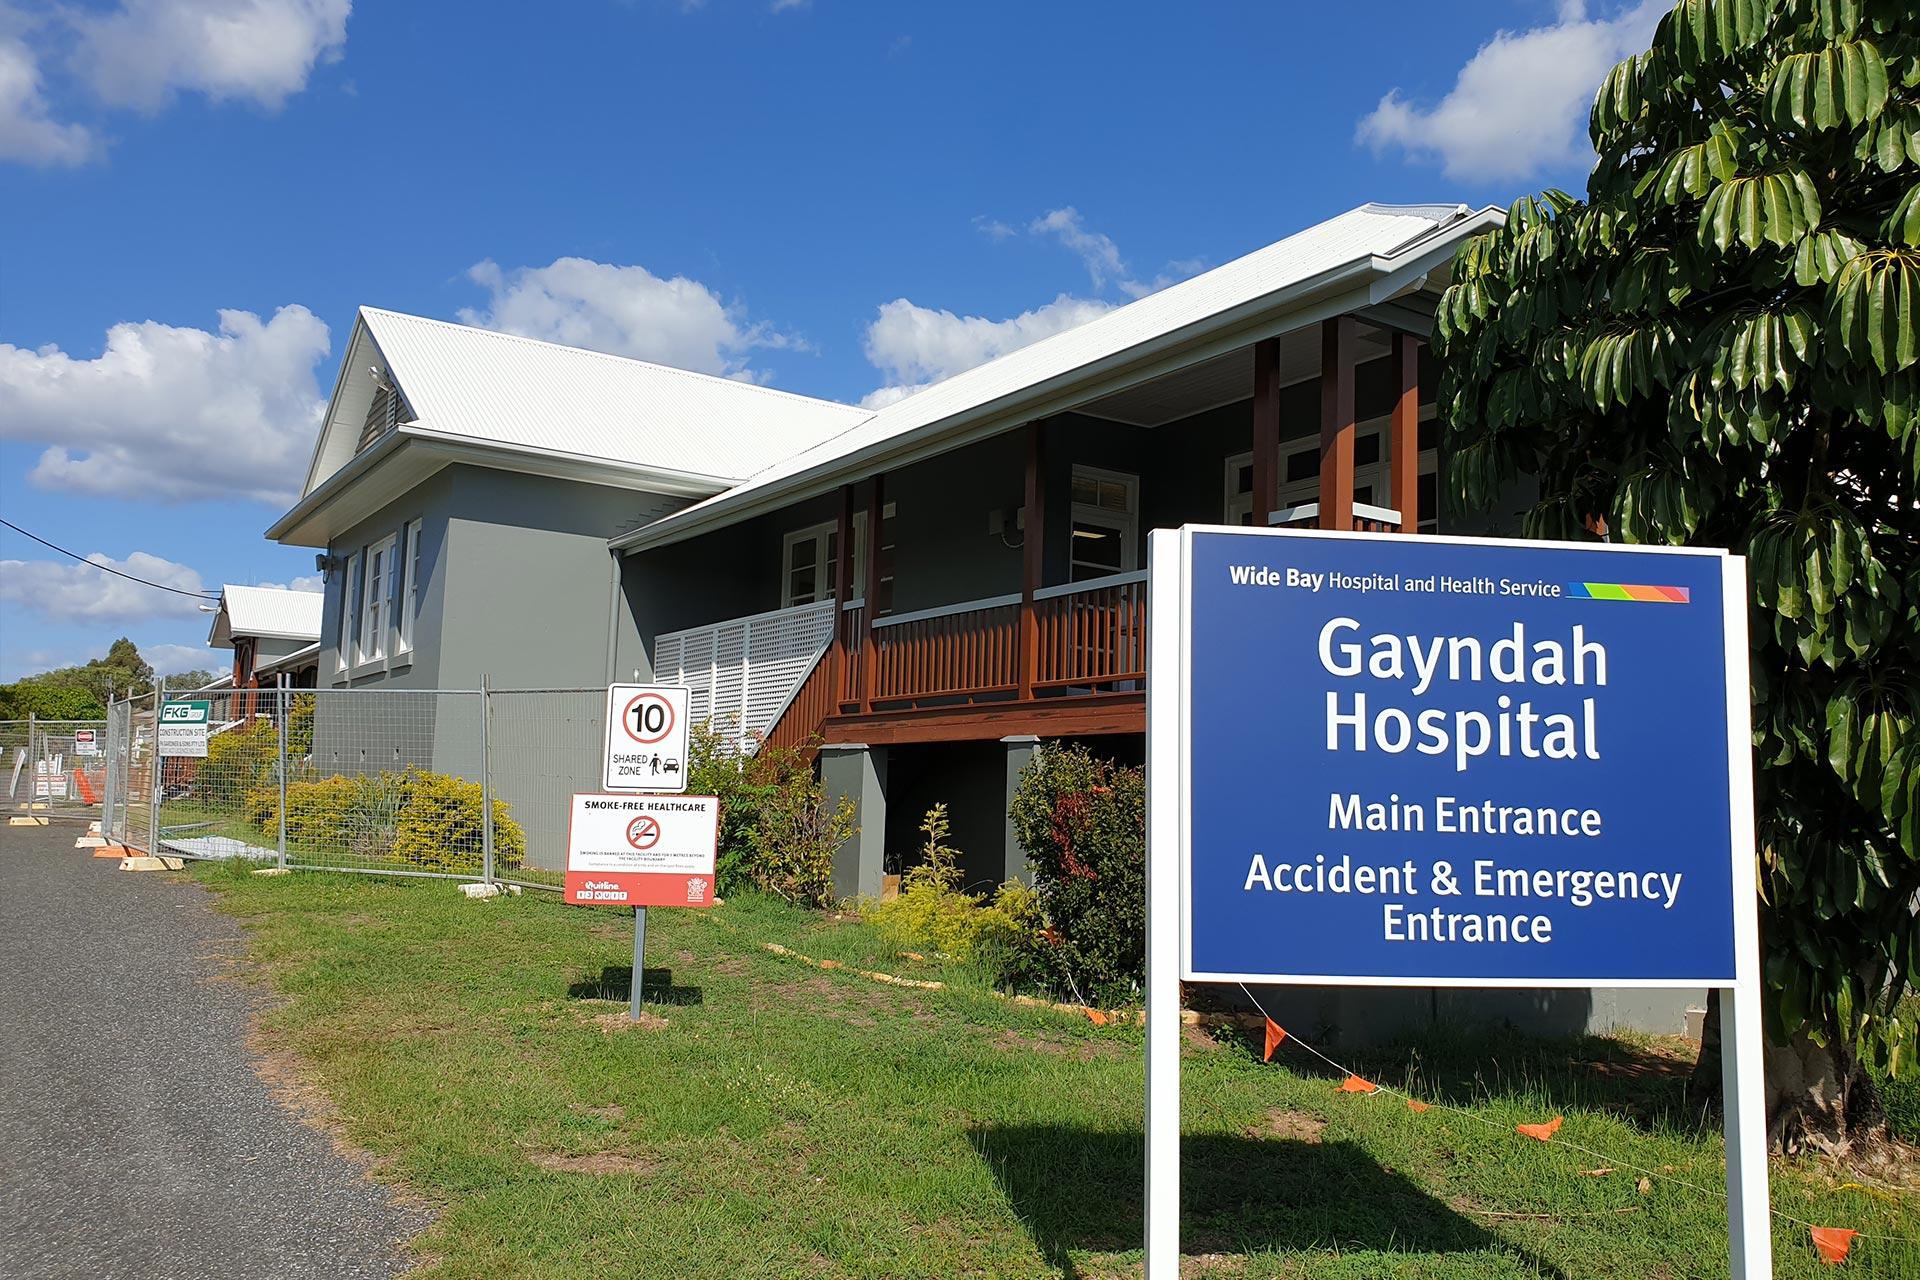 gayndah-hospital-1